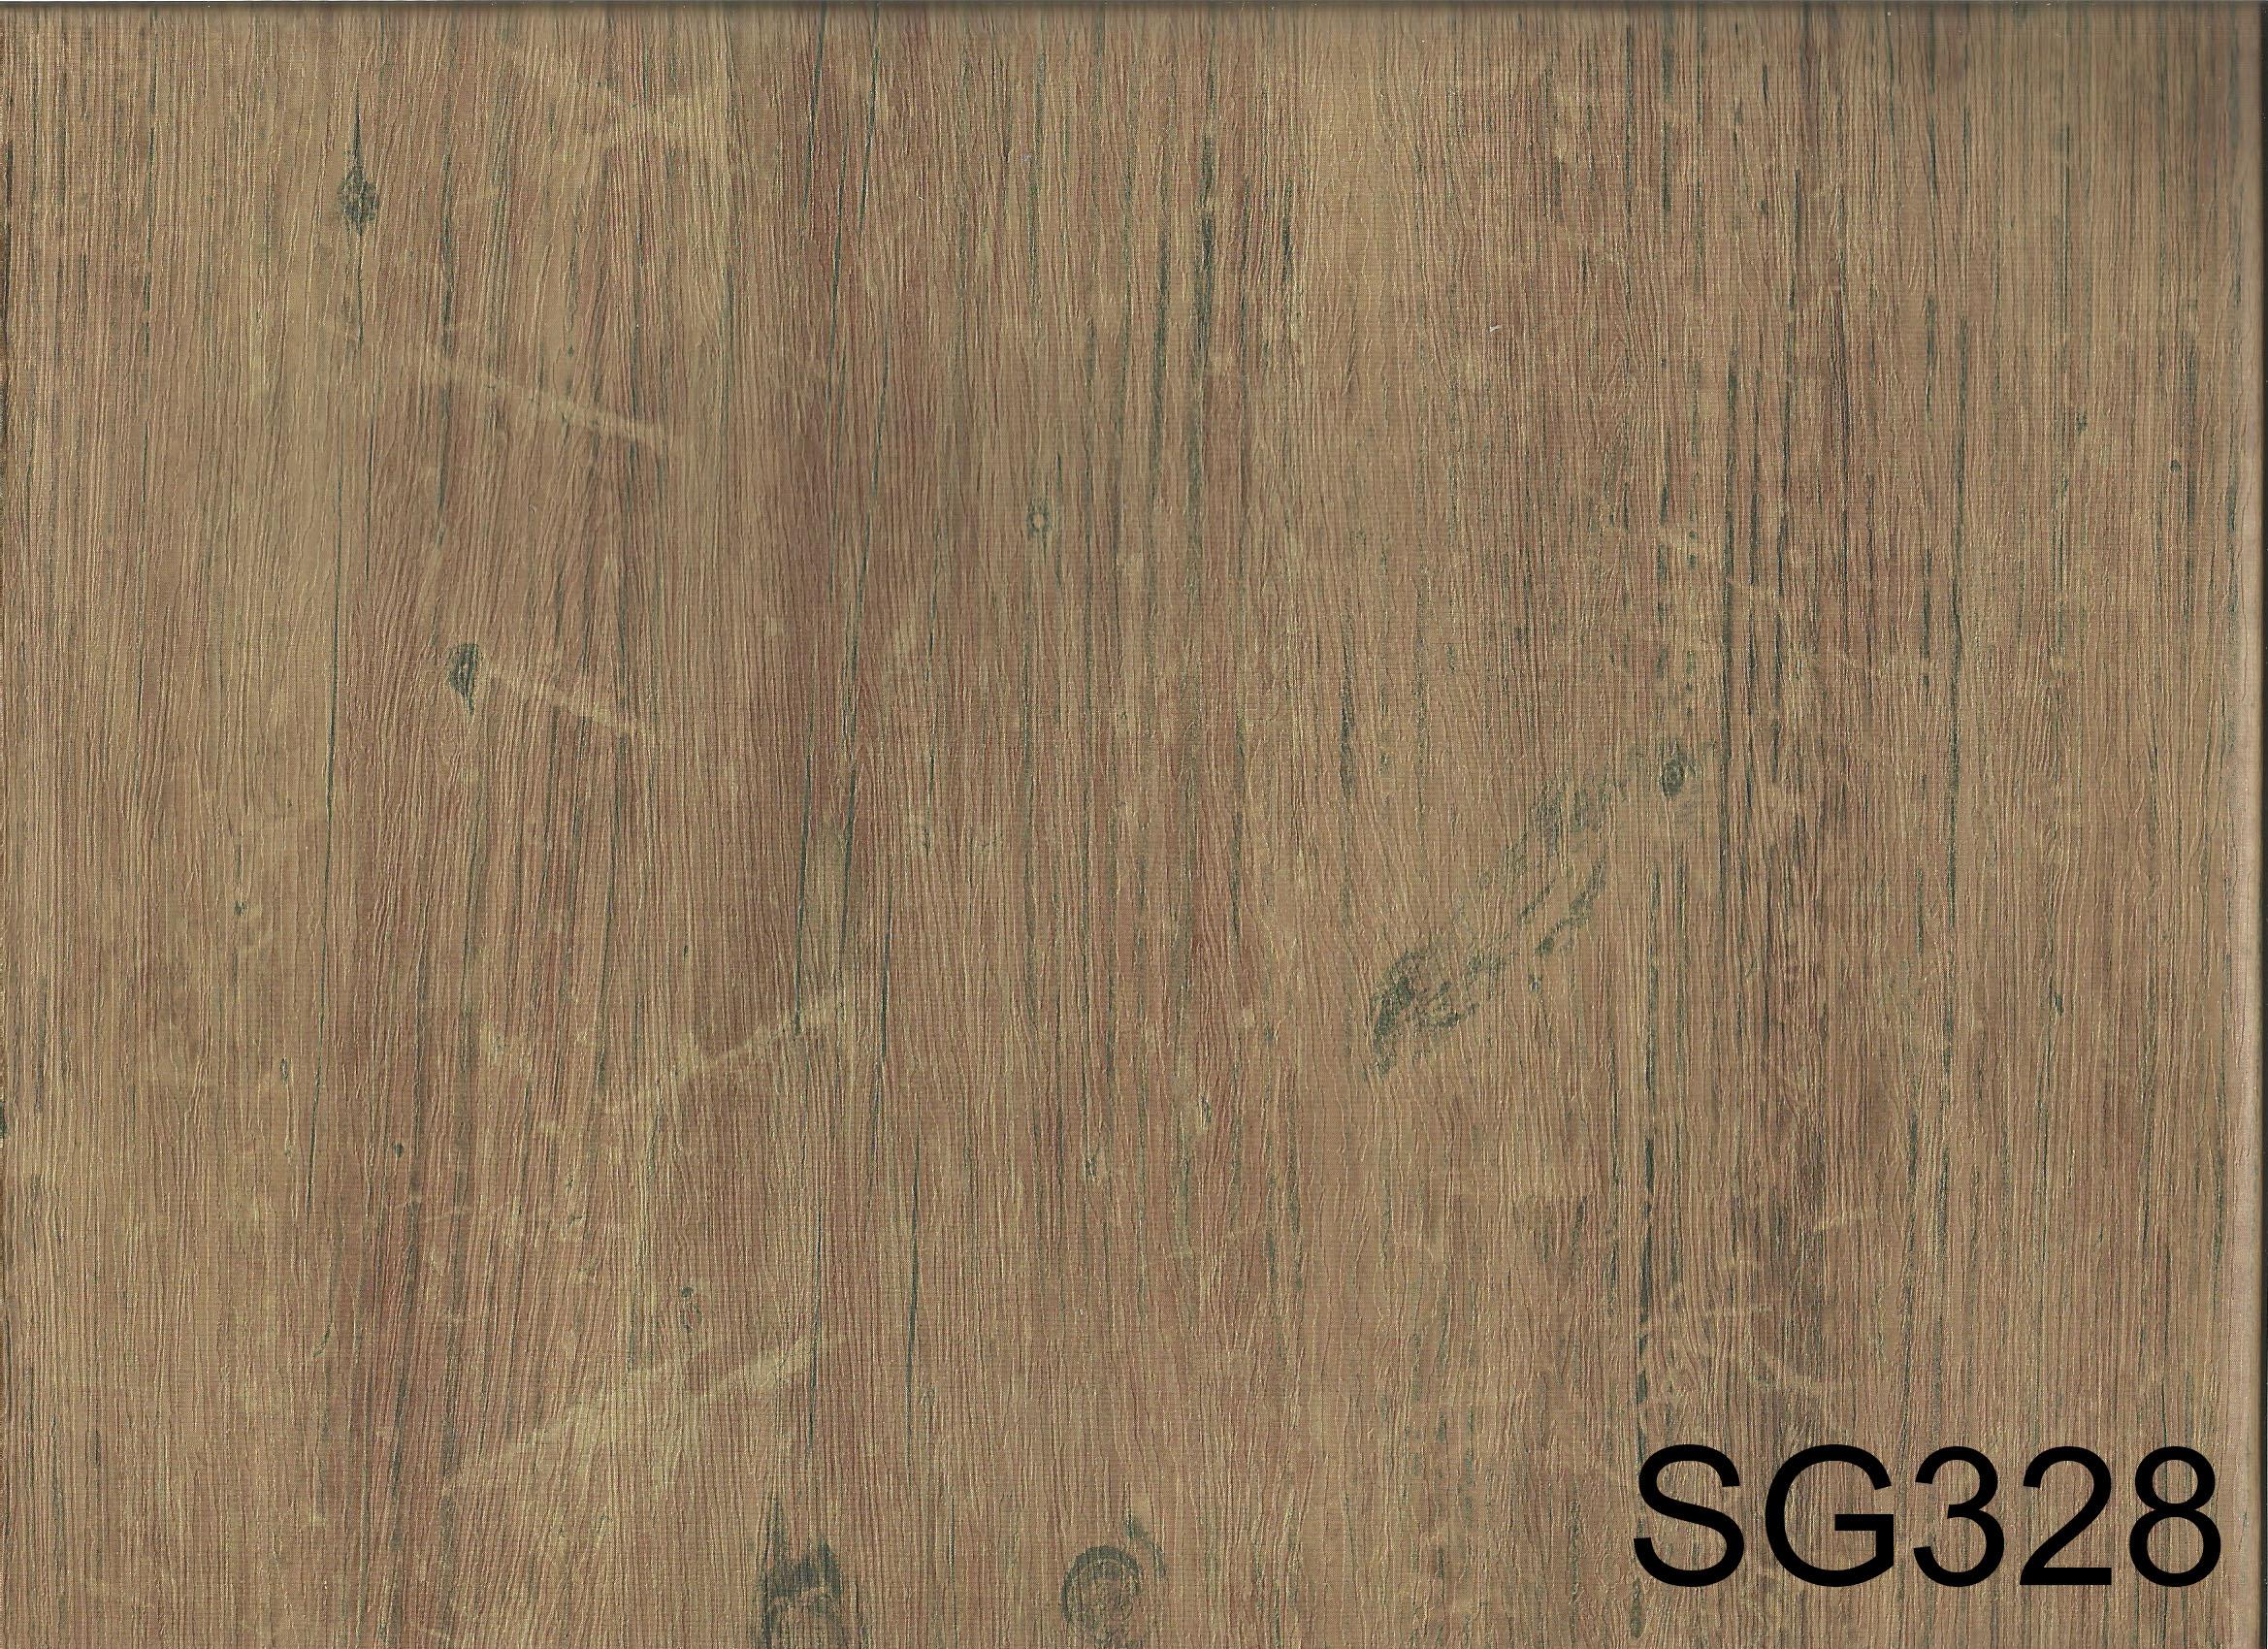 SG328